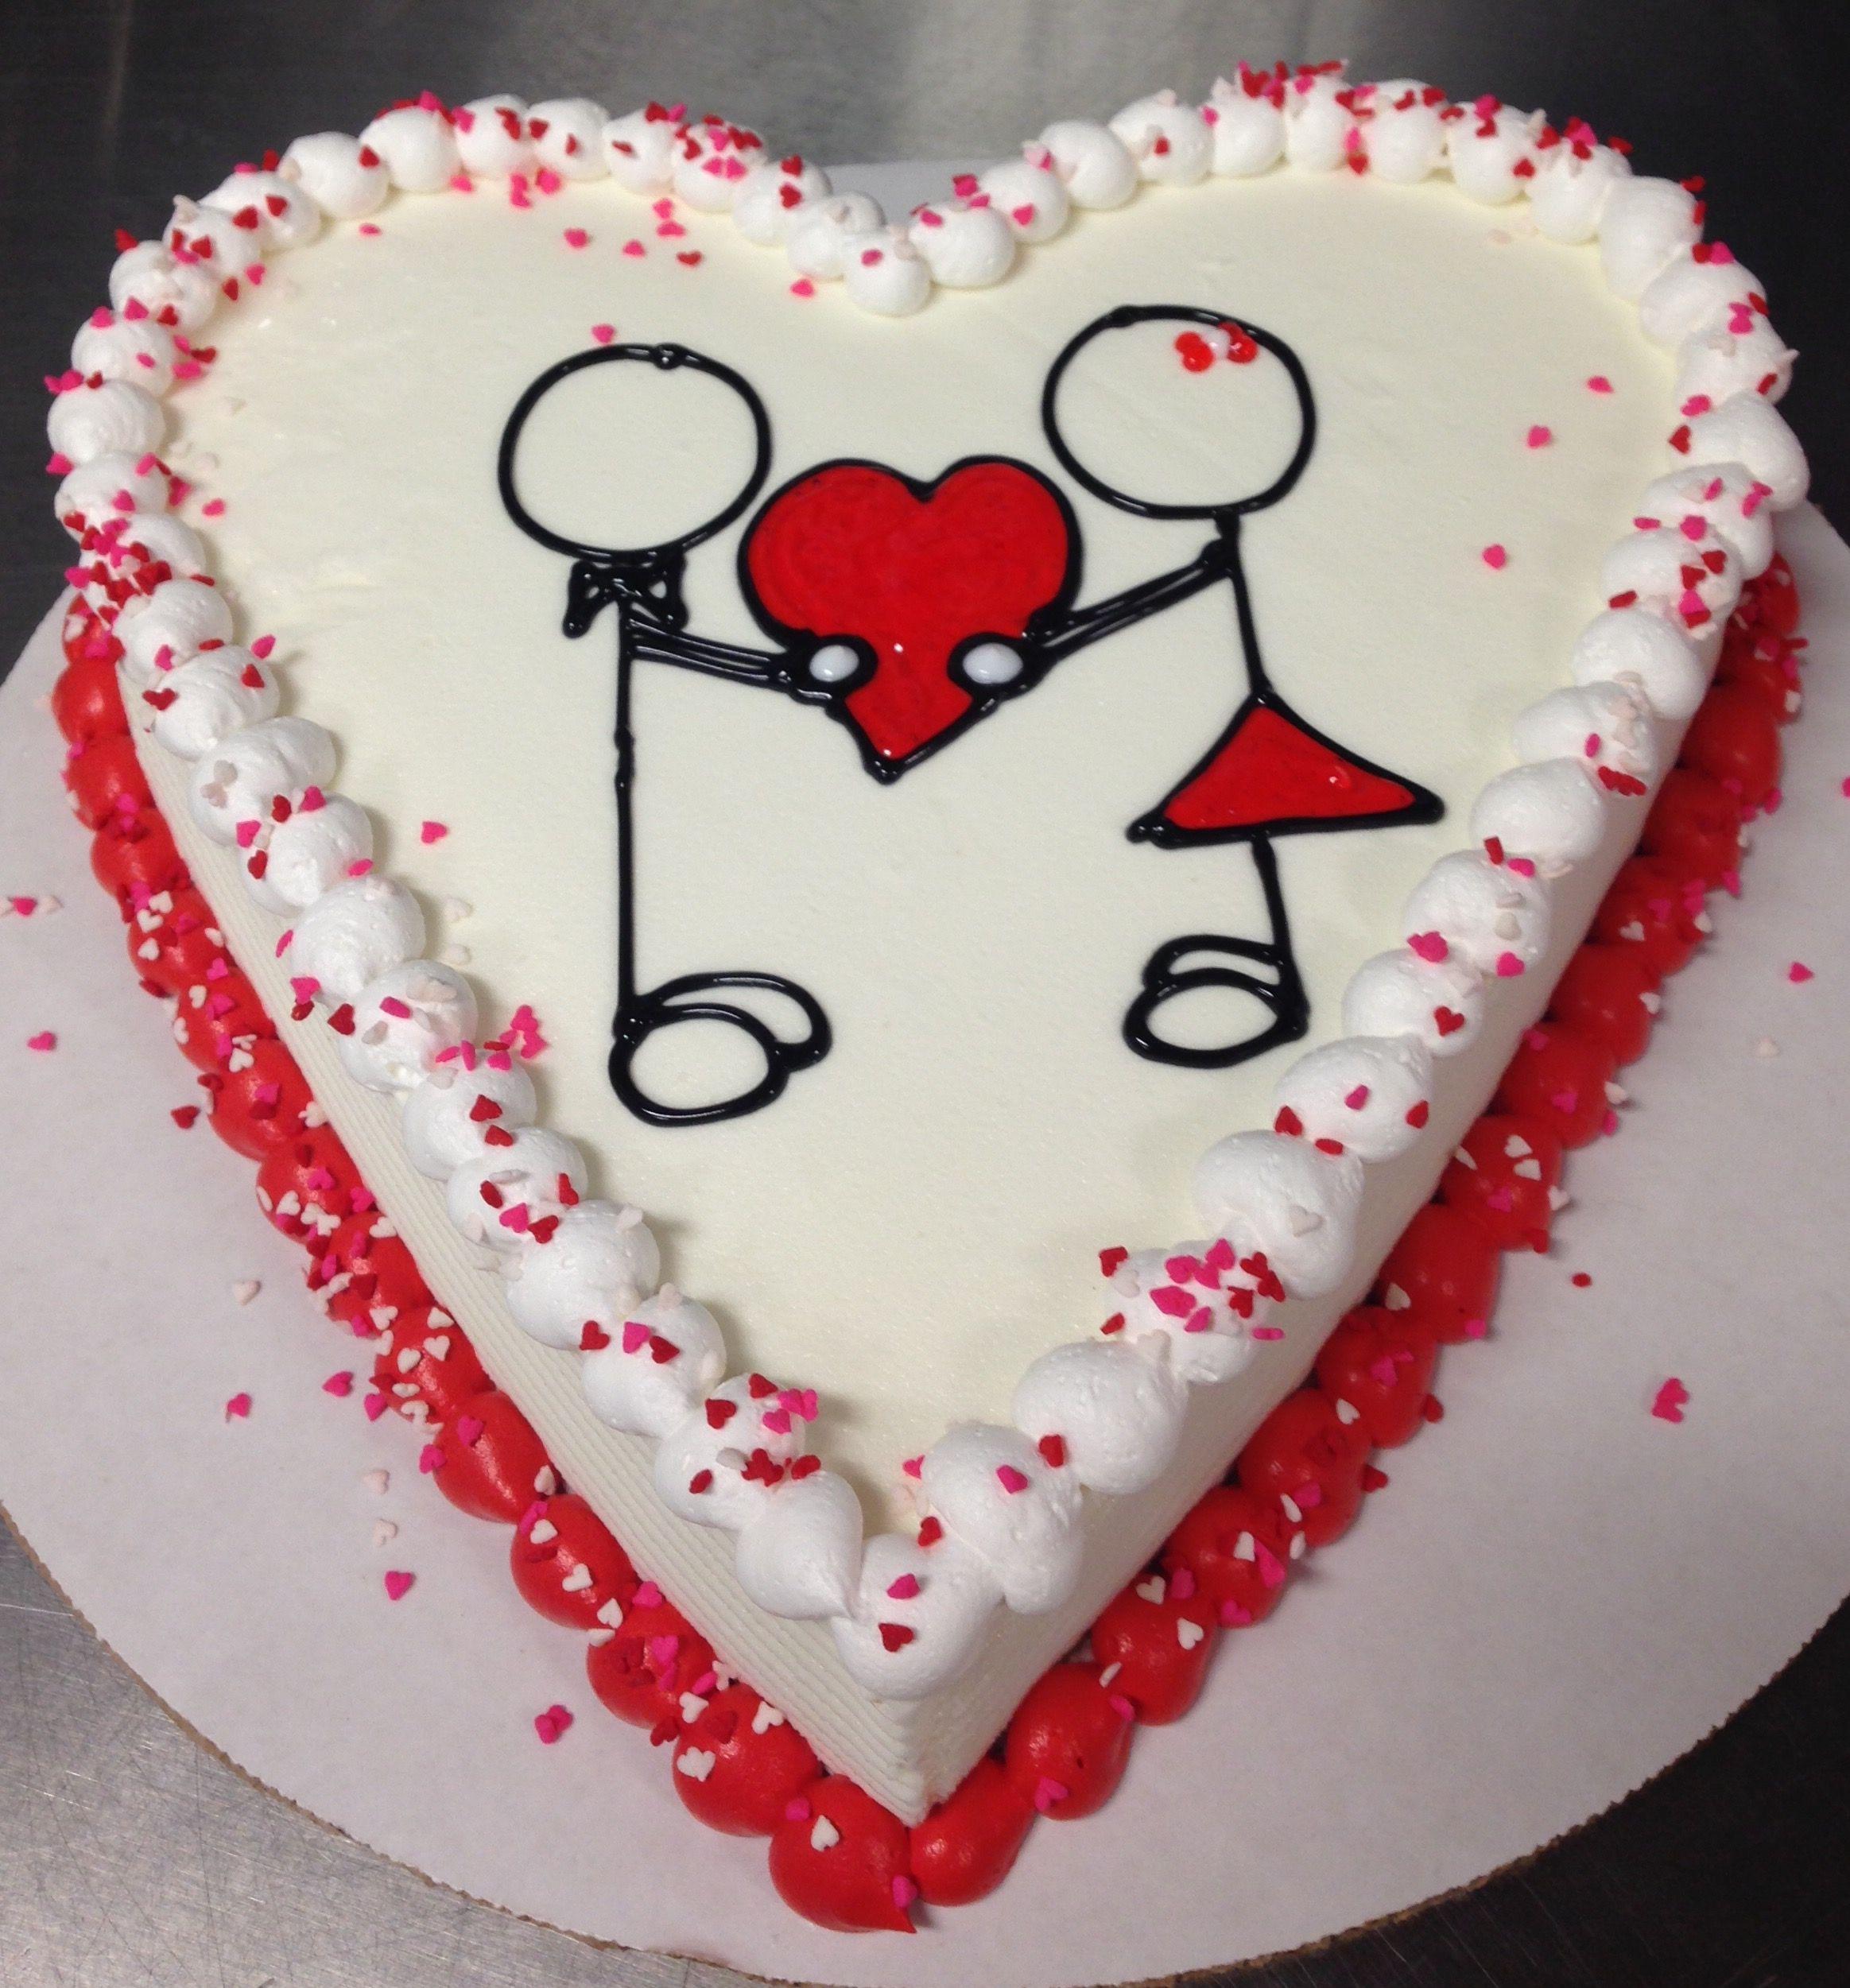 Valentine S Day Dq Heart Ice Cream Cake With Stick Figures Valentine Cake Heart Shape Cake Design Ice Cream Design